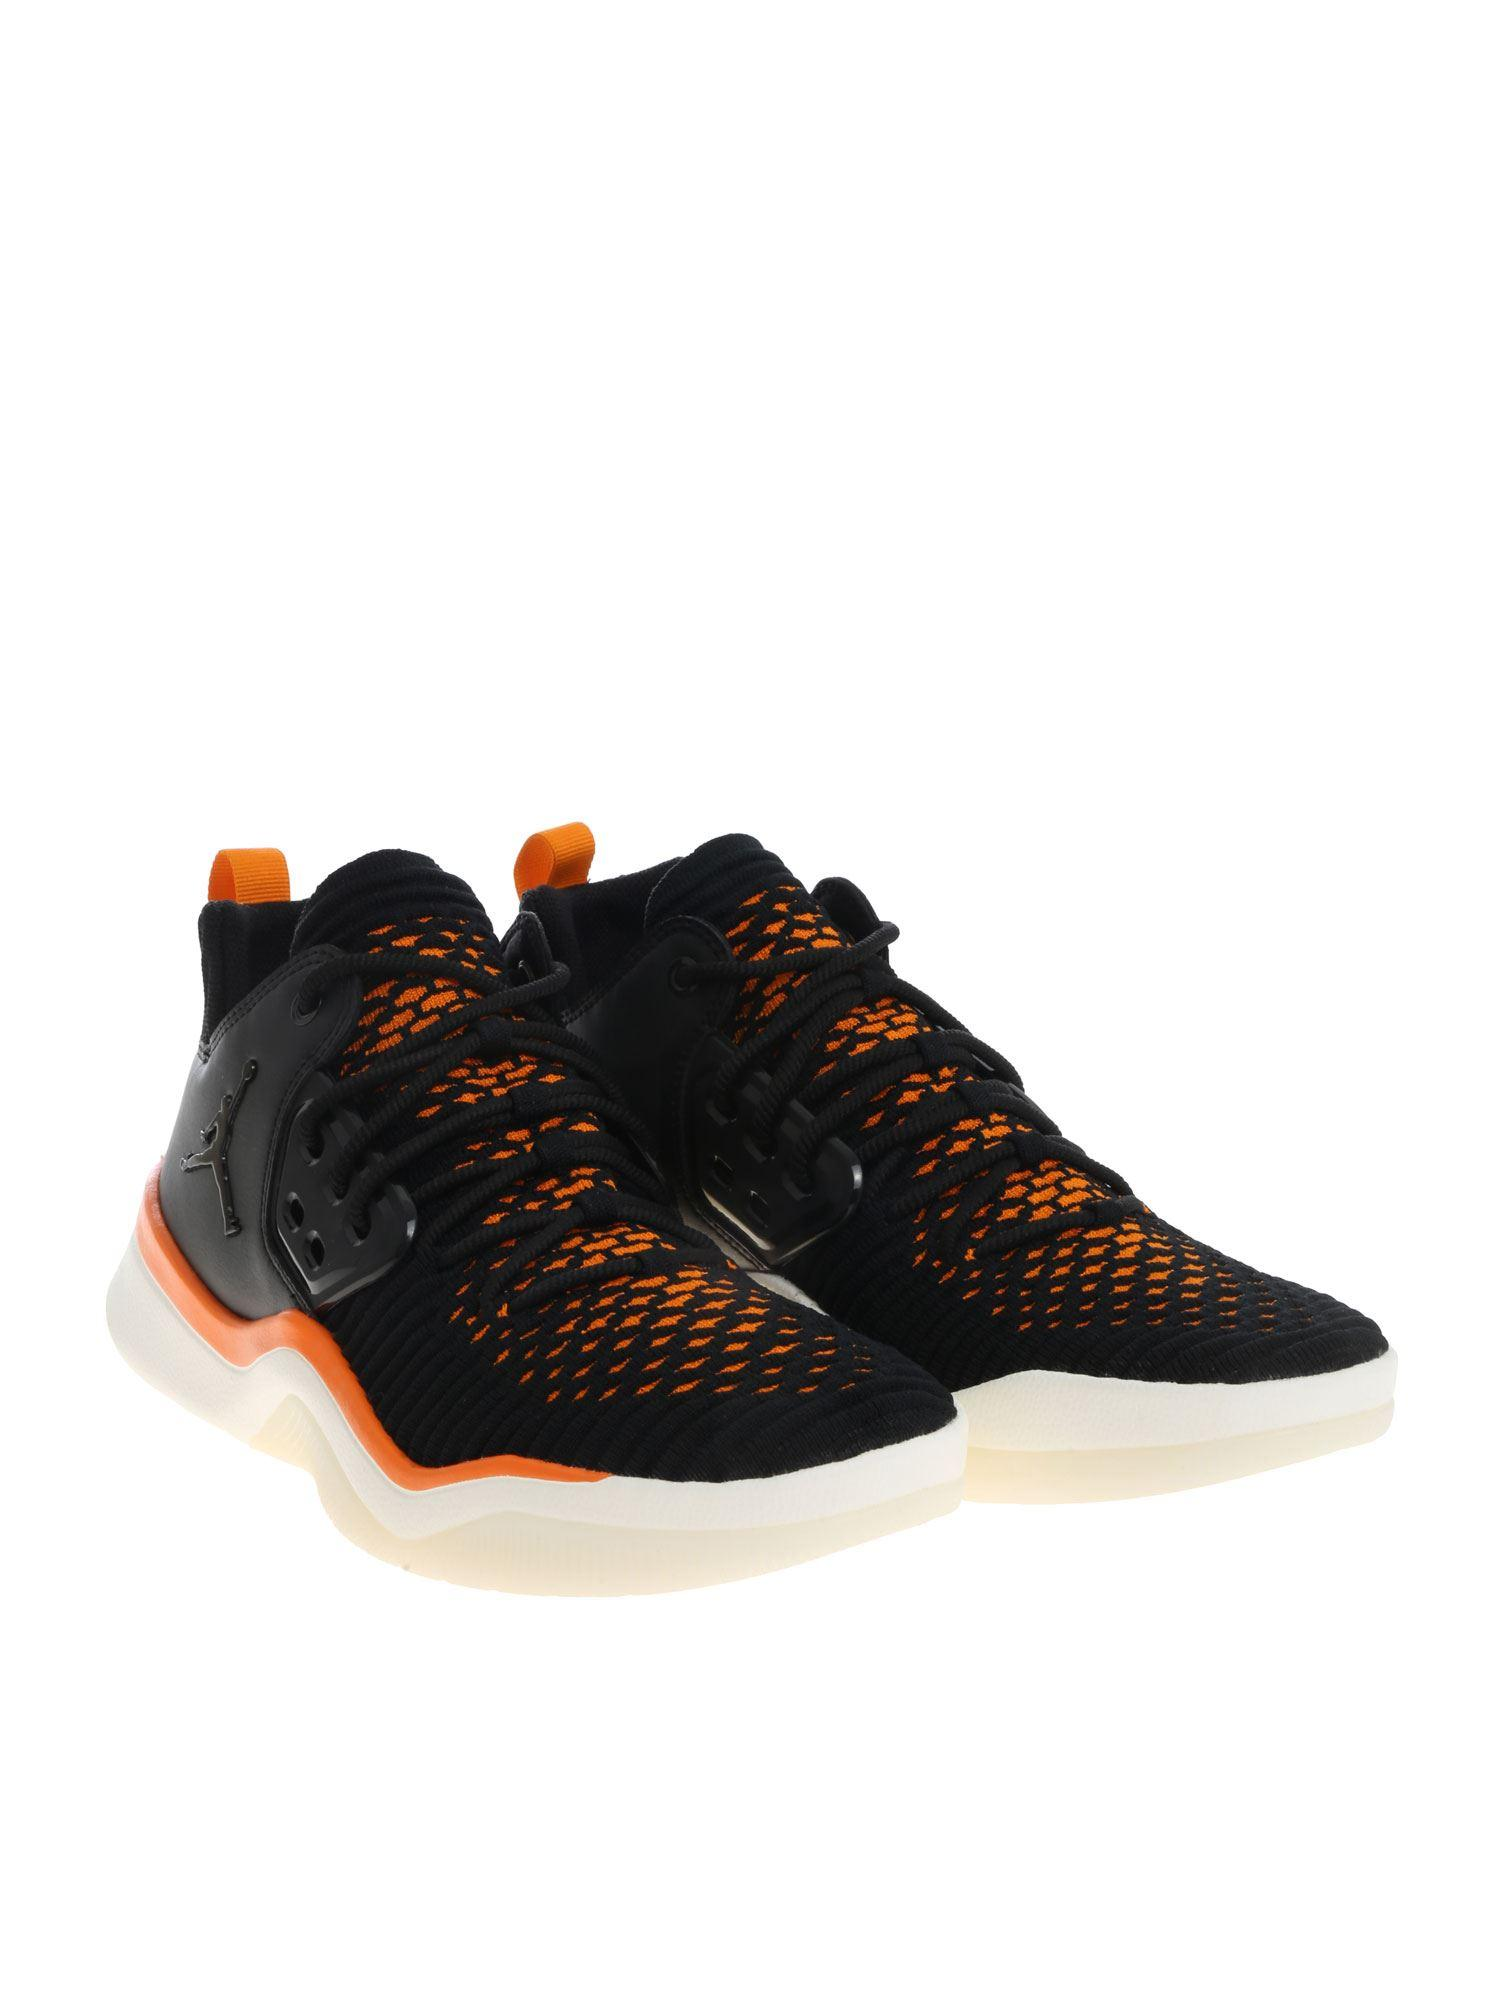 1c41bcc856aab1 Nike